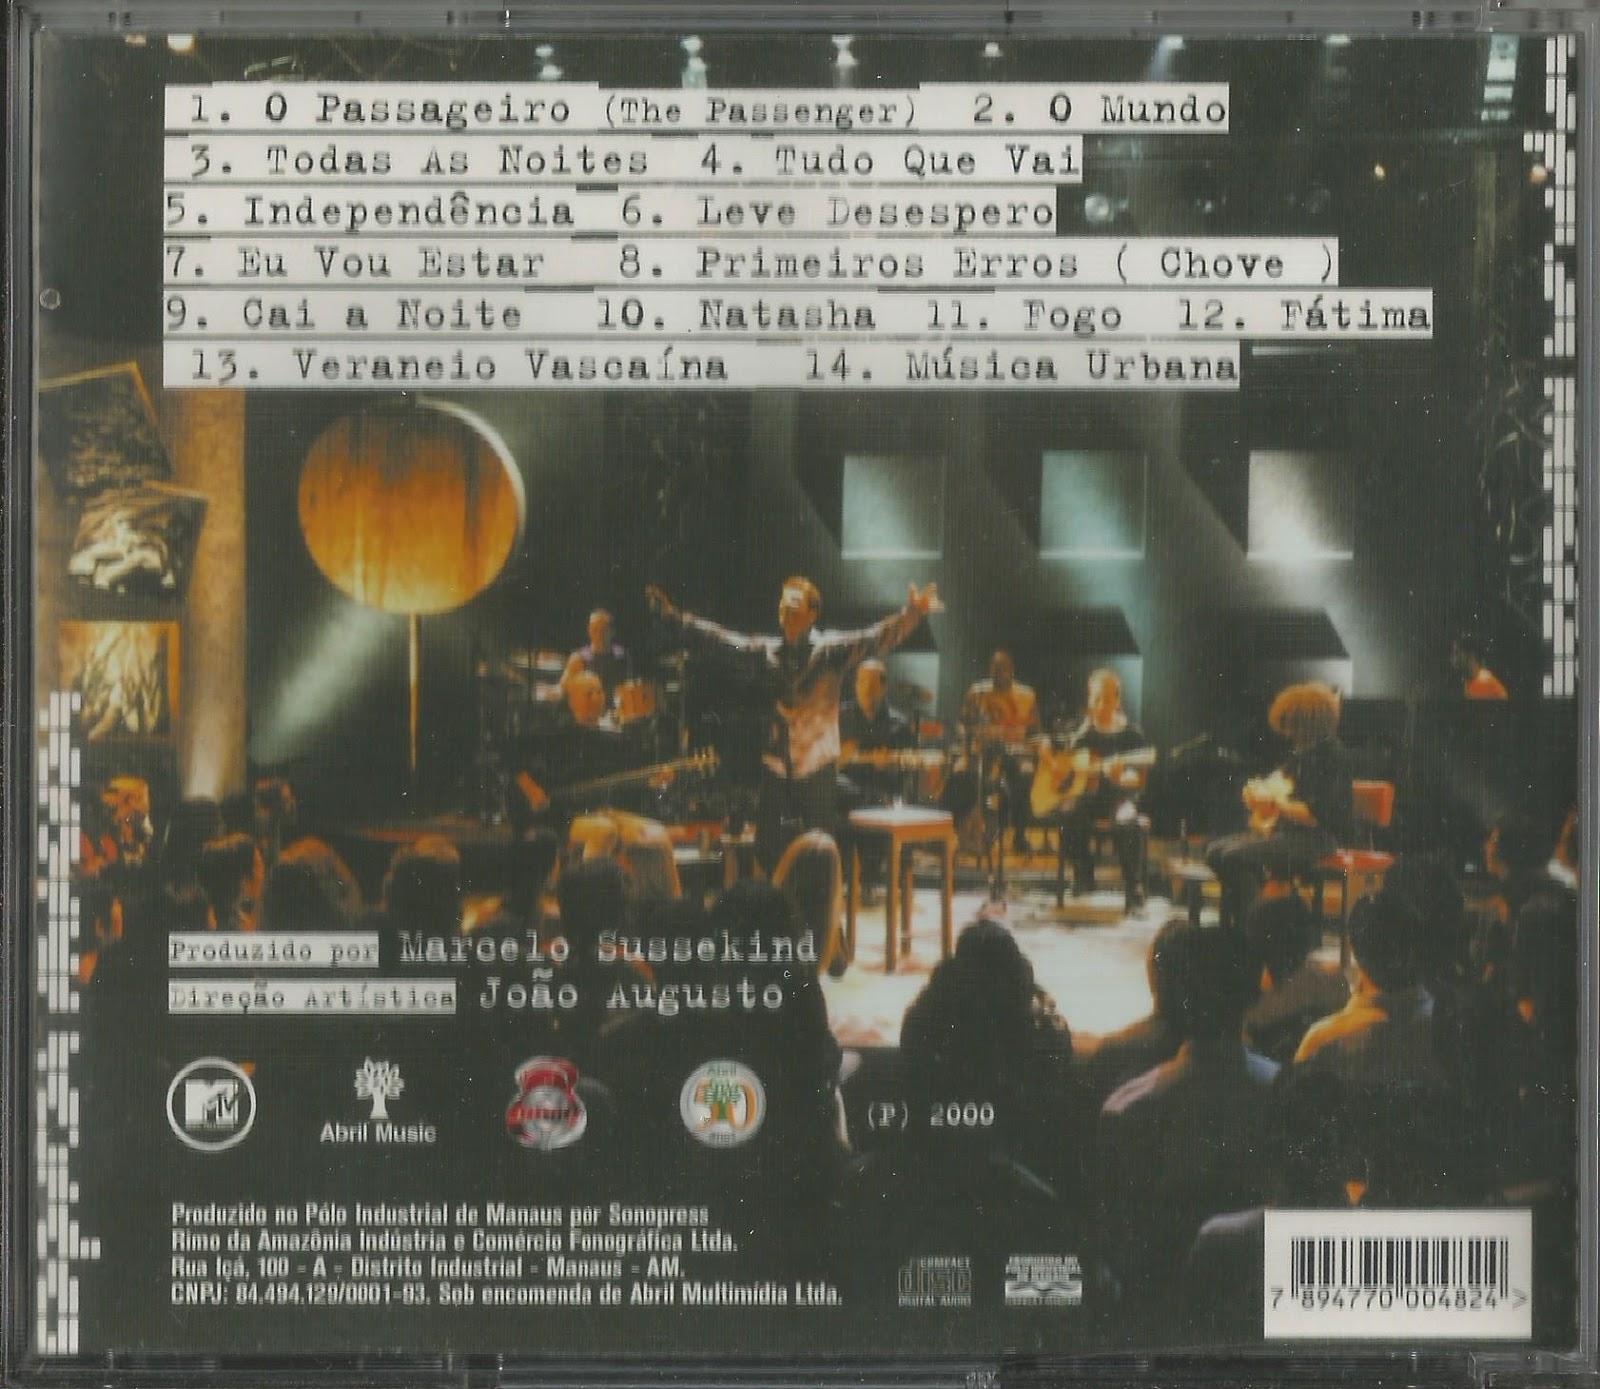 CAPITAL MULTISHOW VIVO INICIAL GRATIS DVD BAIXAR AO